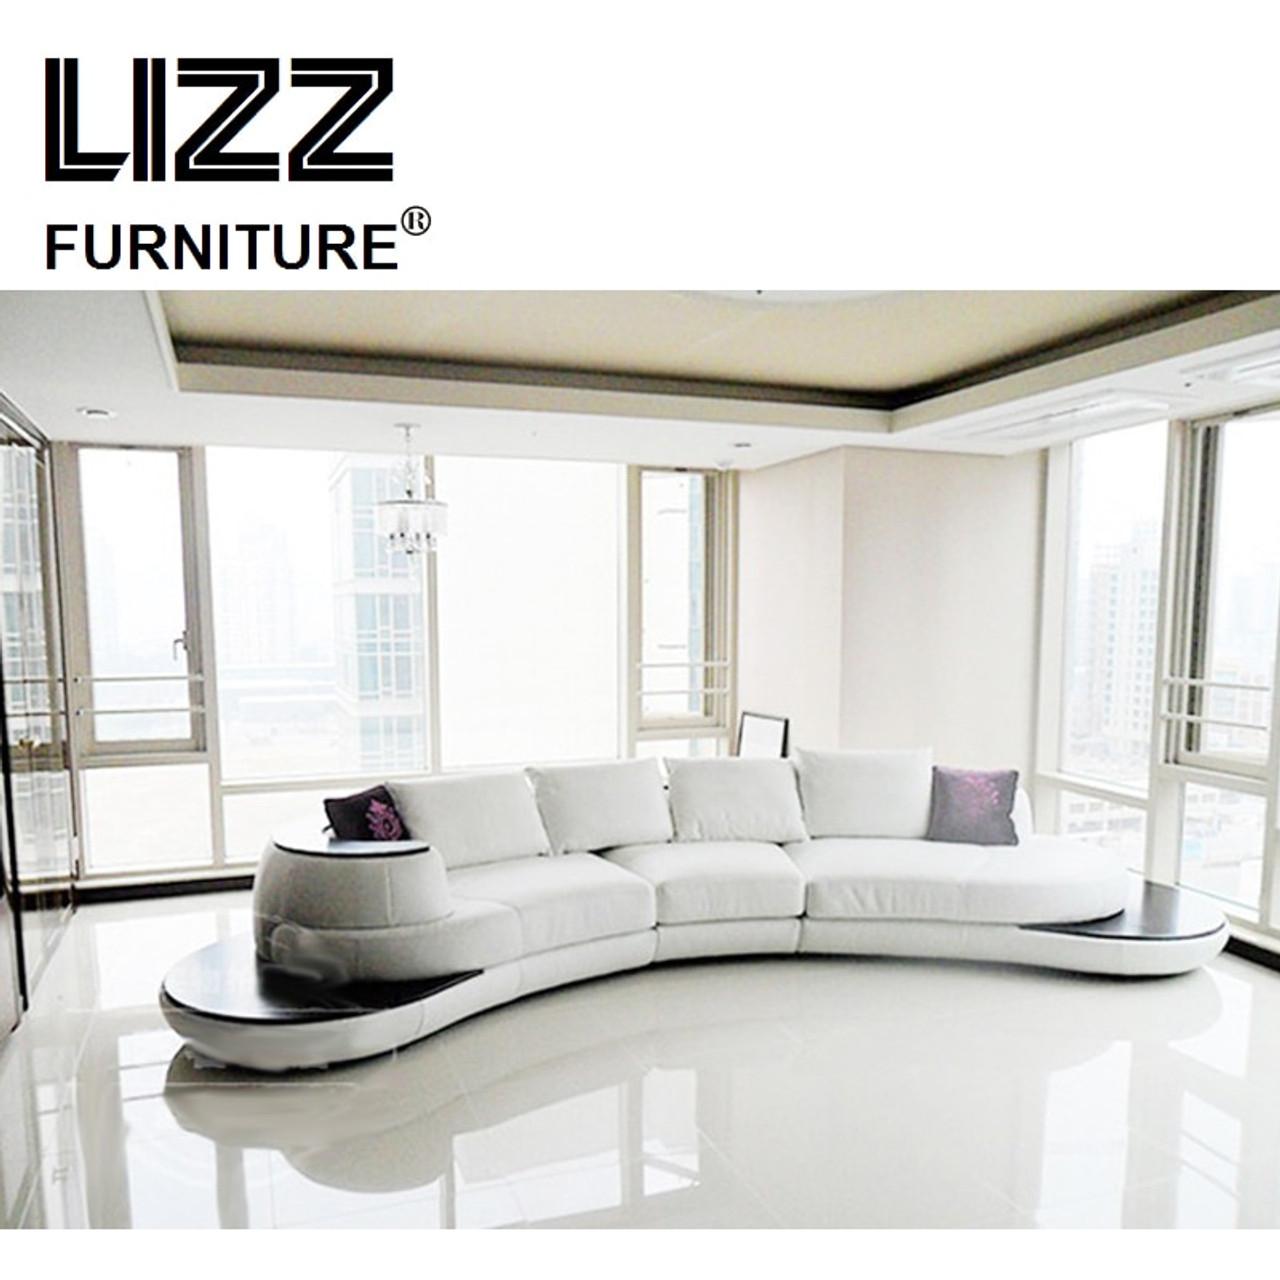 captivating shape sofa living room sets | Leather Furniture Arc C Shape Sectional Sofa Set For ...